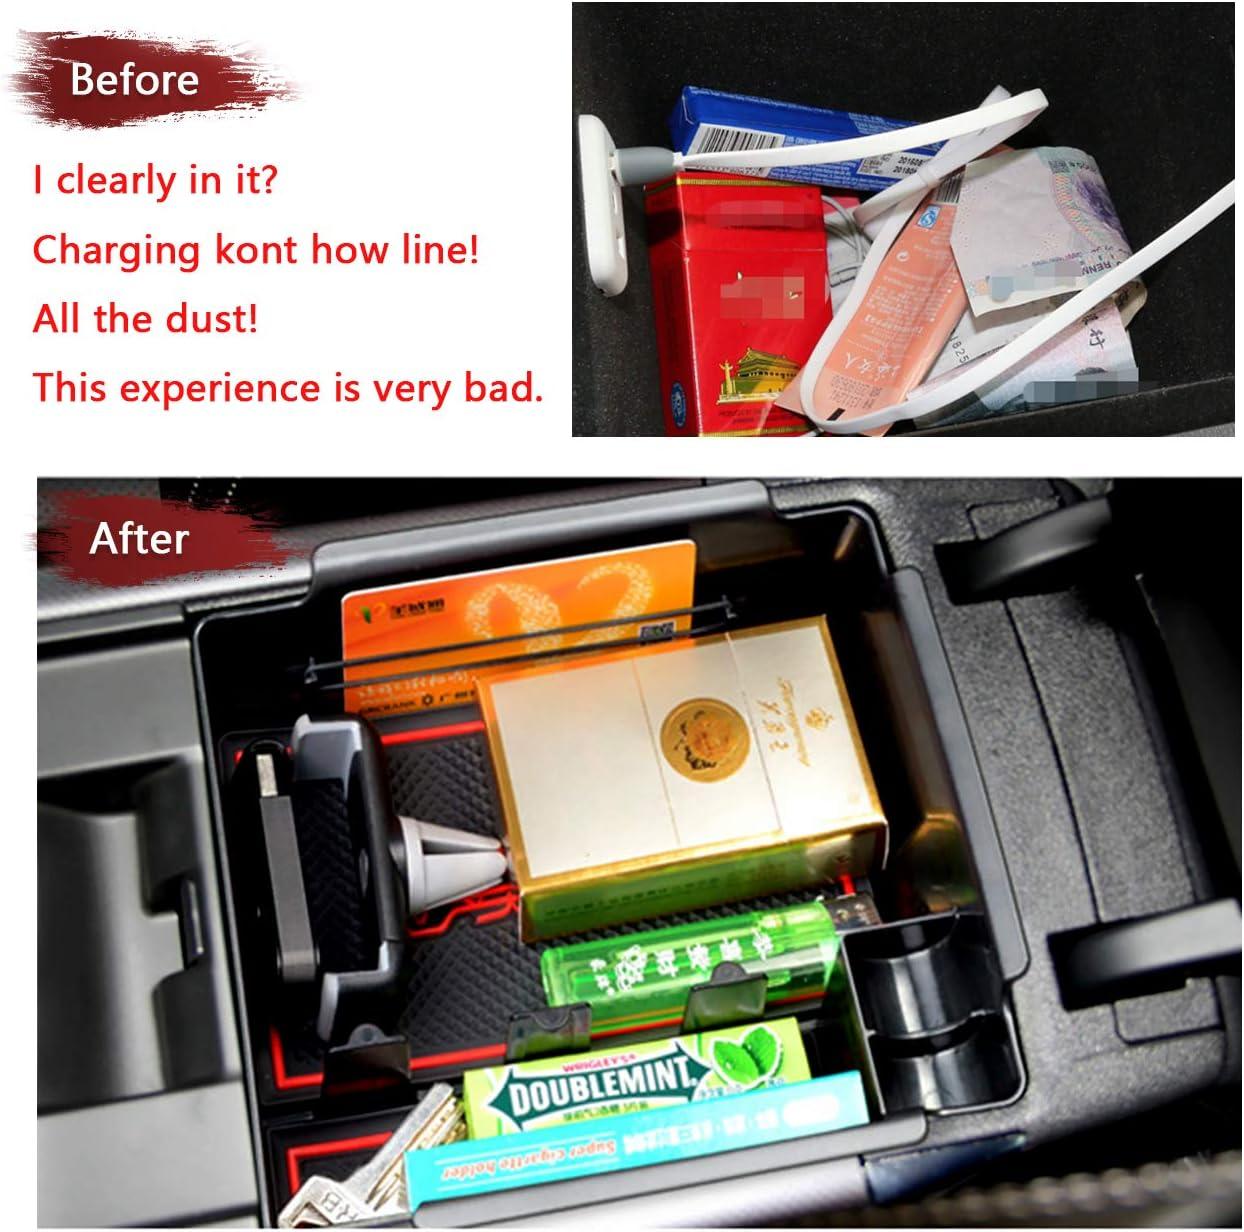 LFOTPP Renault Koleos SUV 2017 Armrest Center Console Organizer Tray Accessories with Sunglasses Holder,Car Accessories Secondary Storage Box